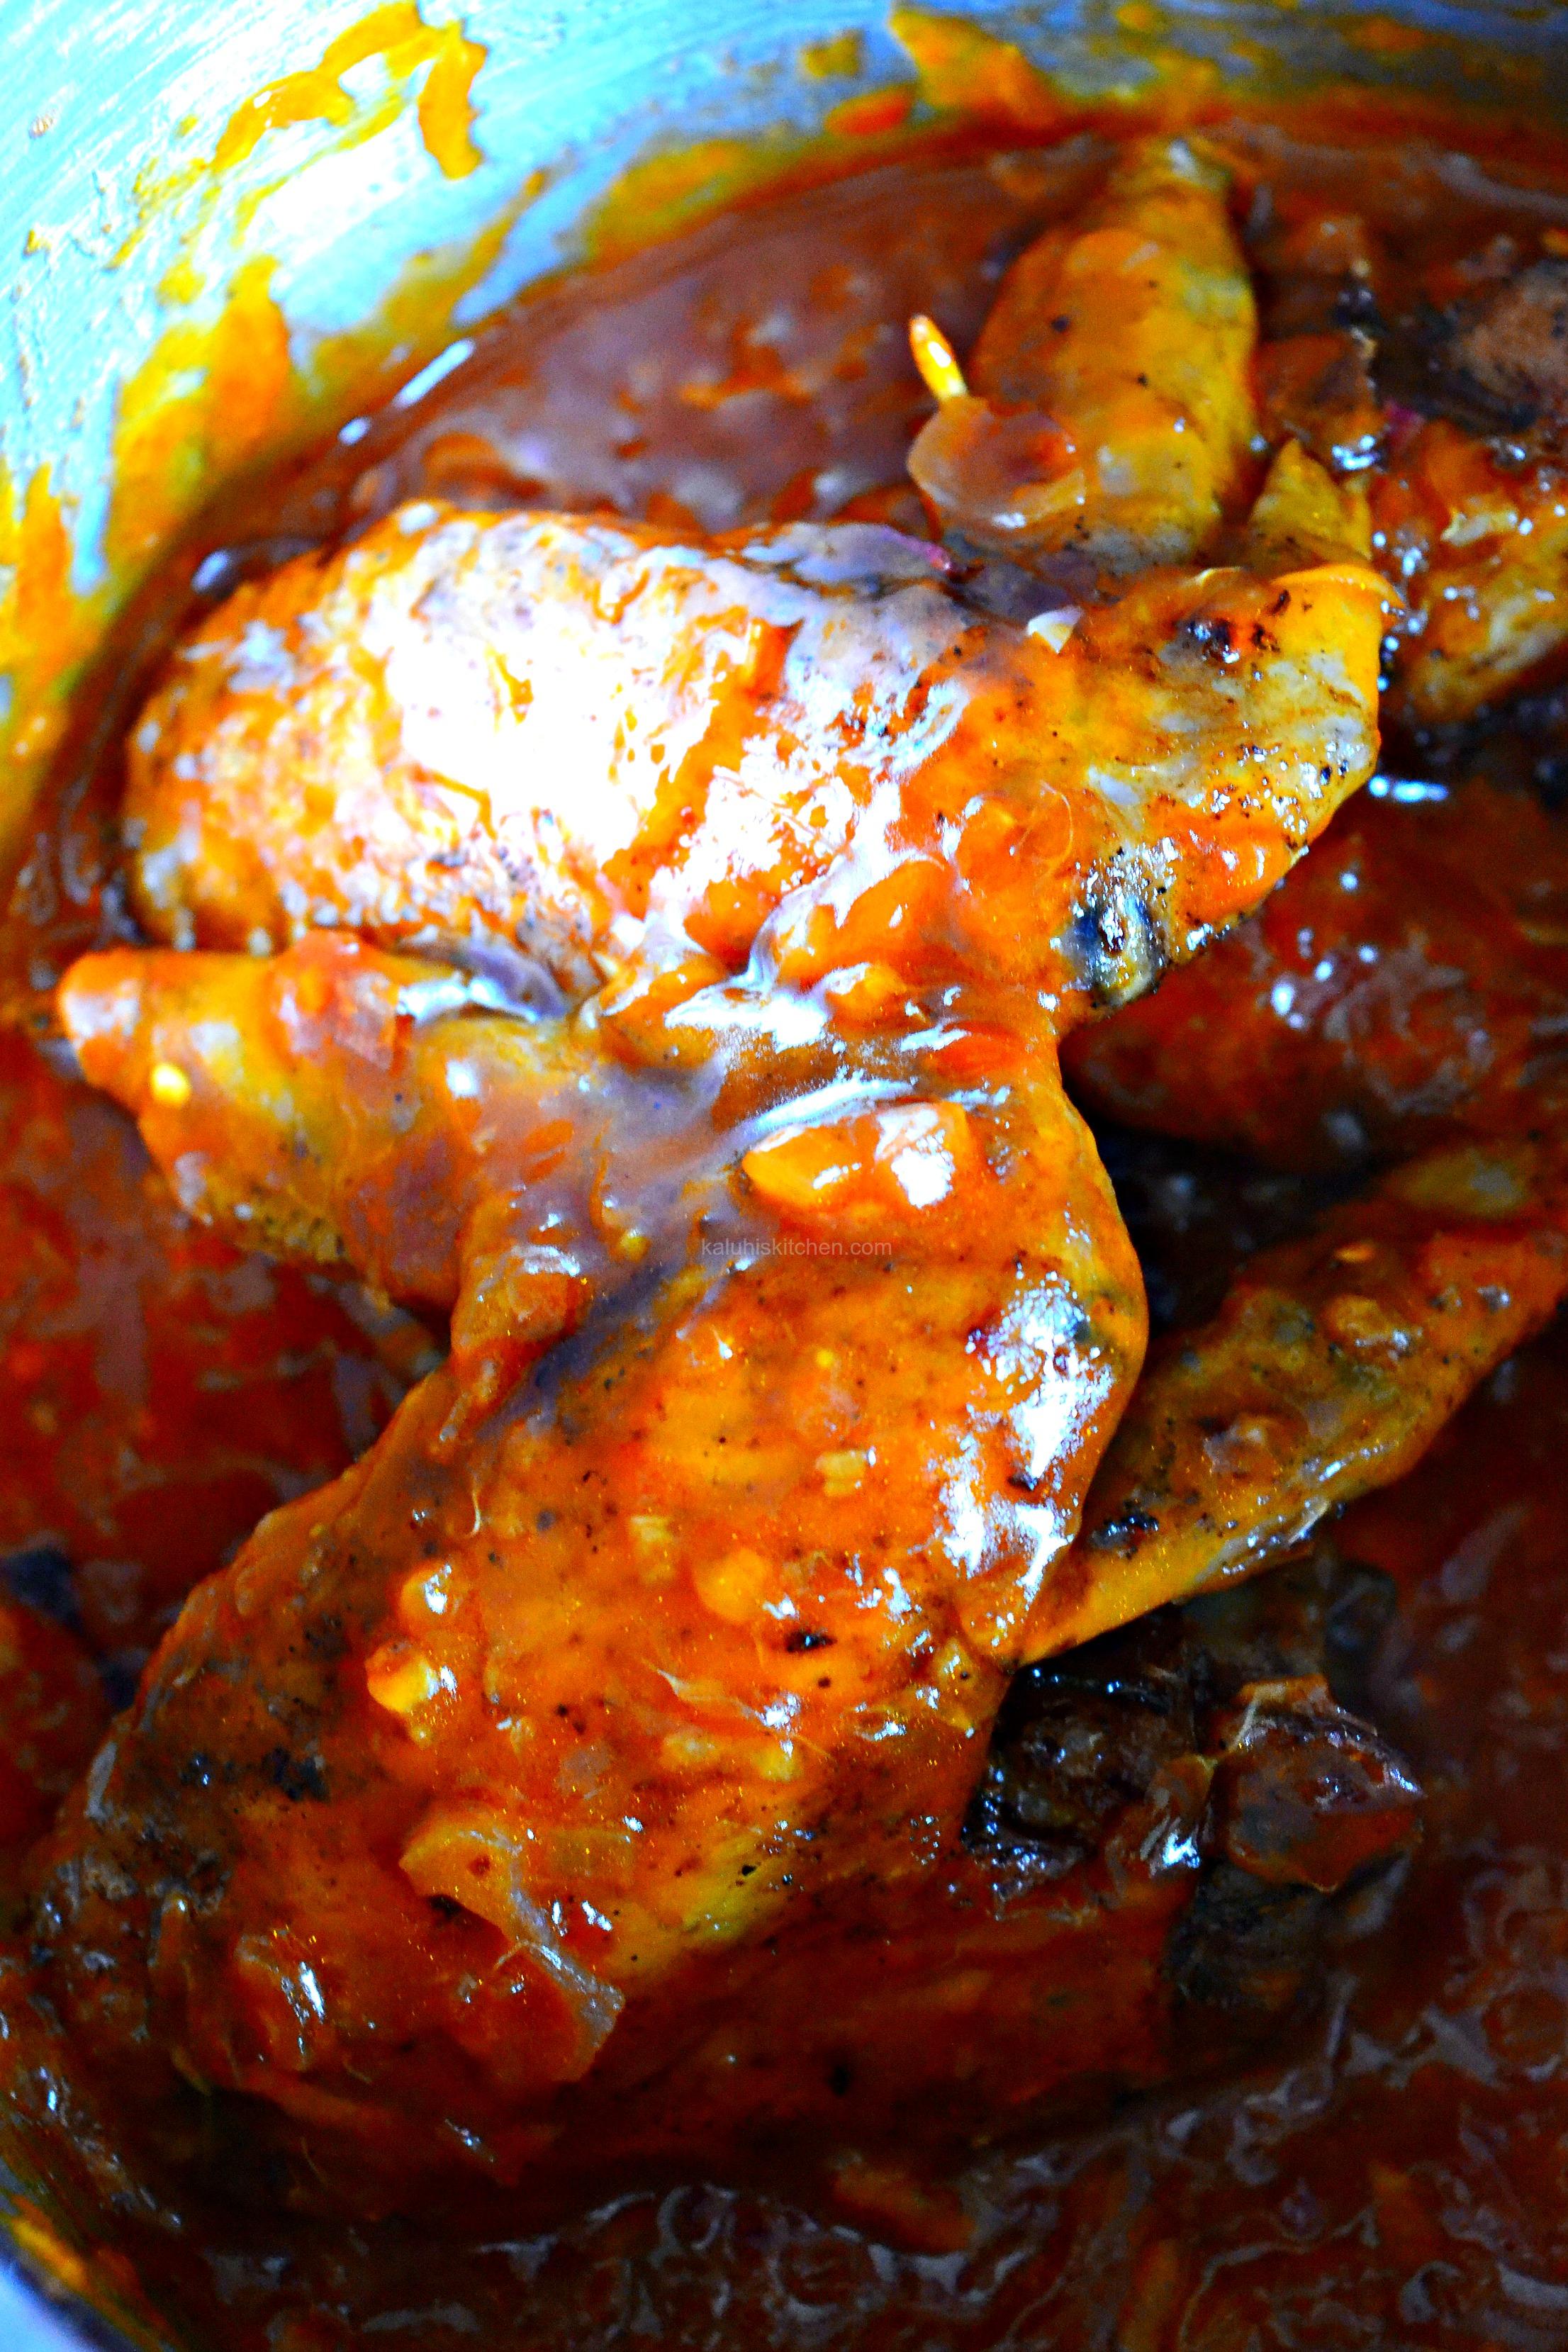 Chili Chicken wings in Orange Whiskey Sauce